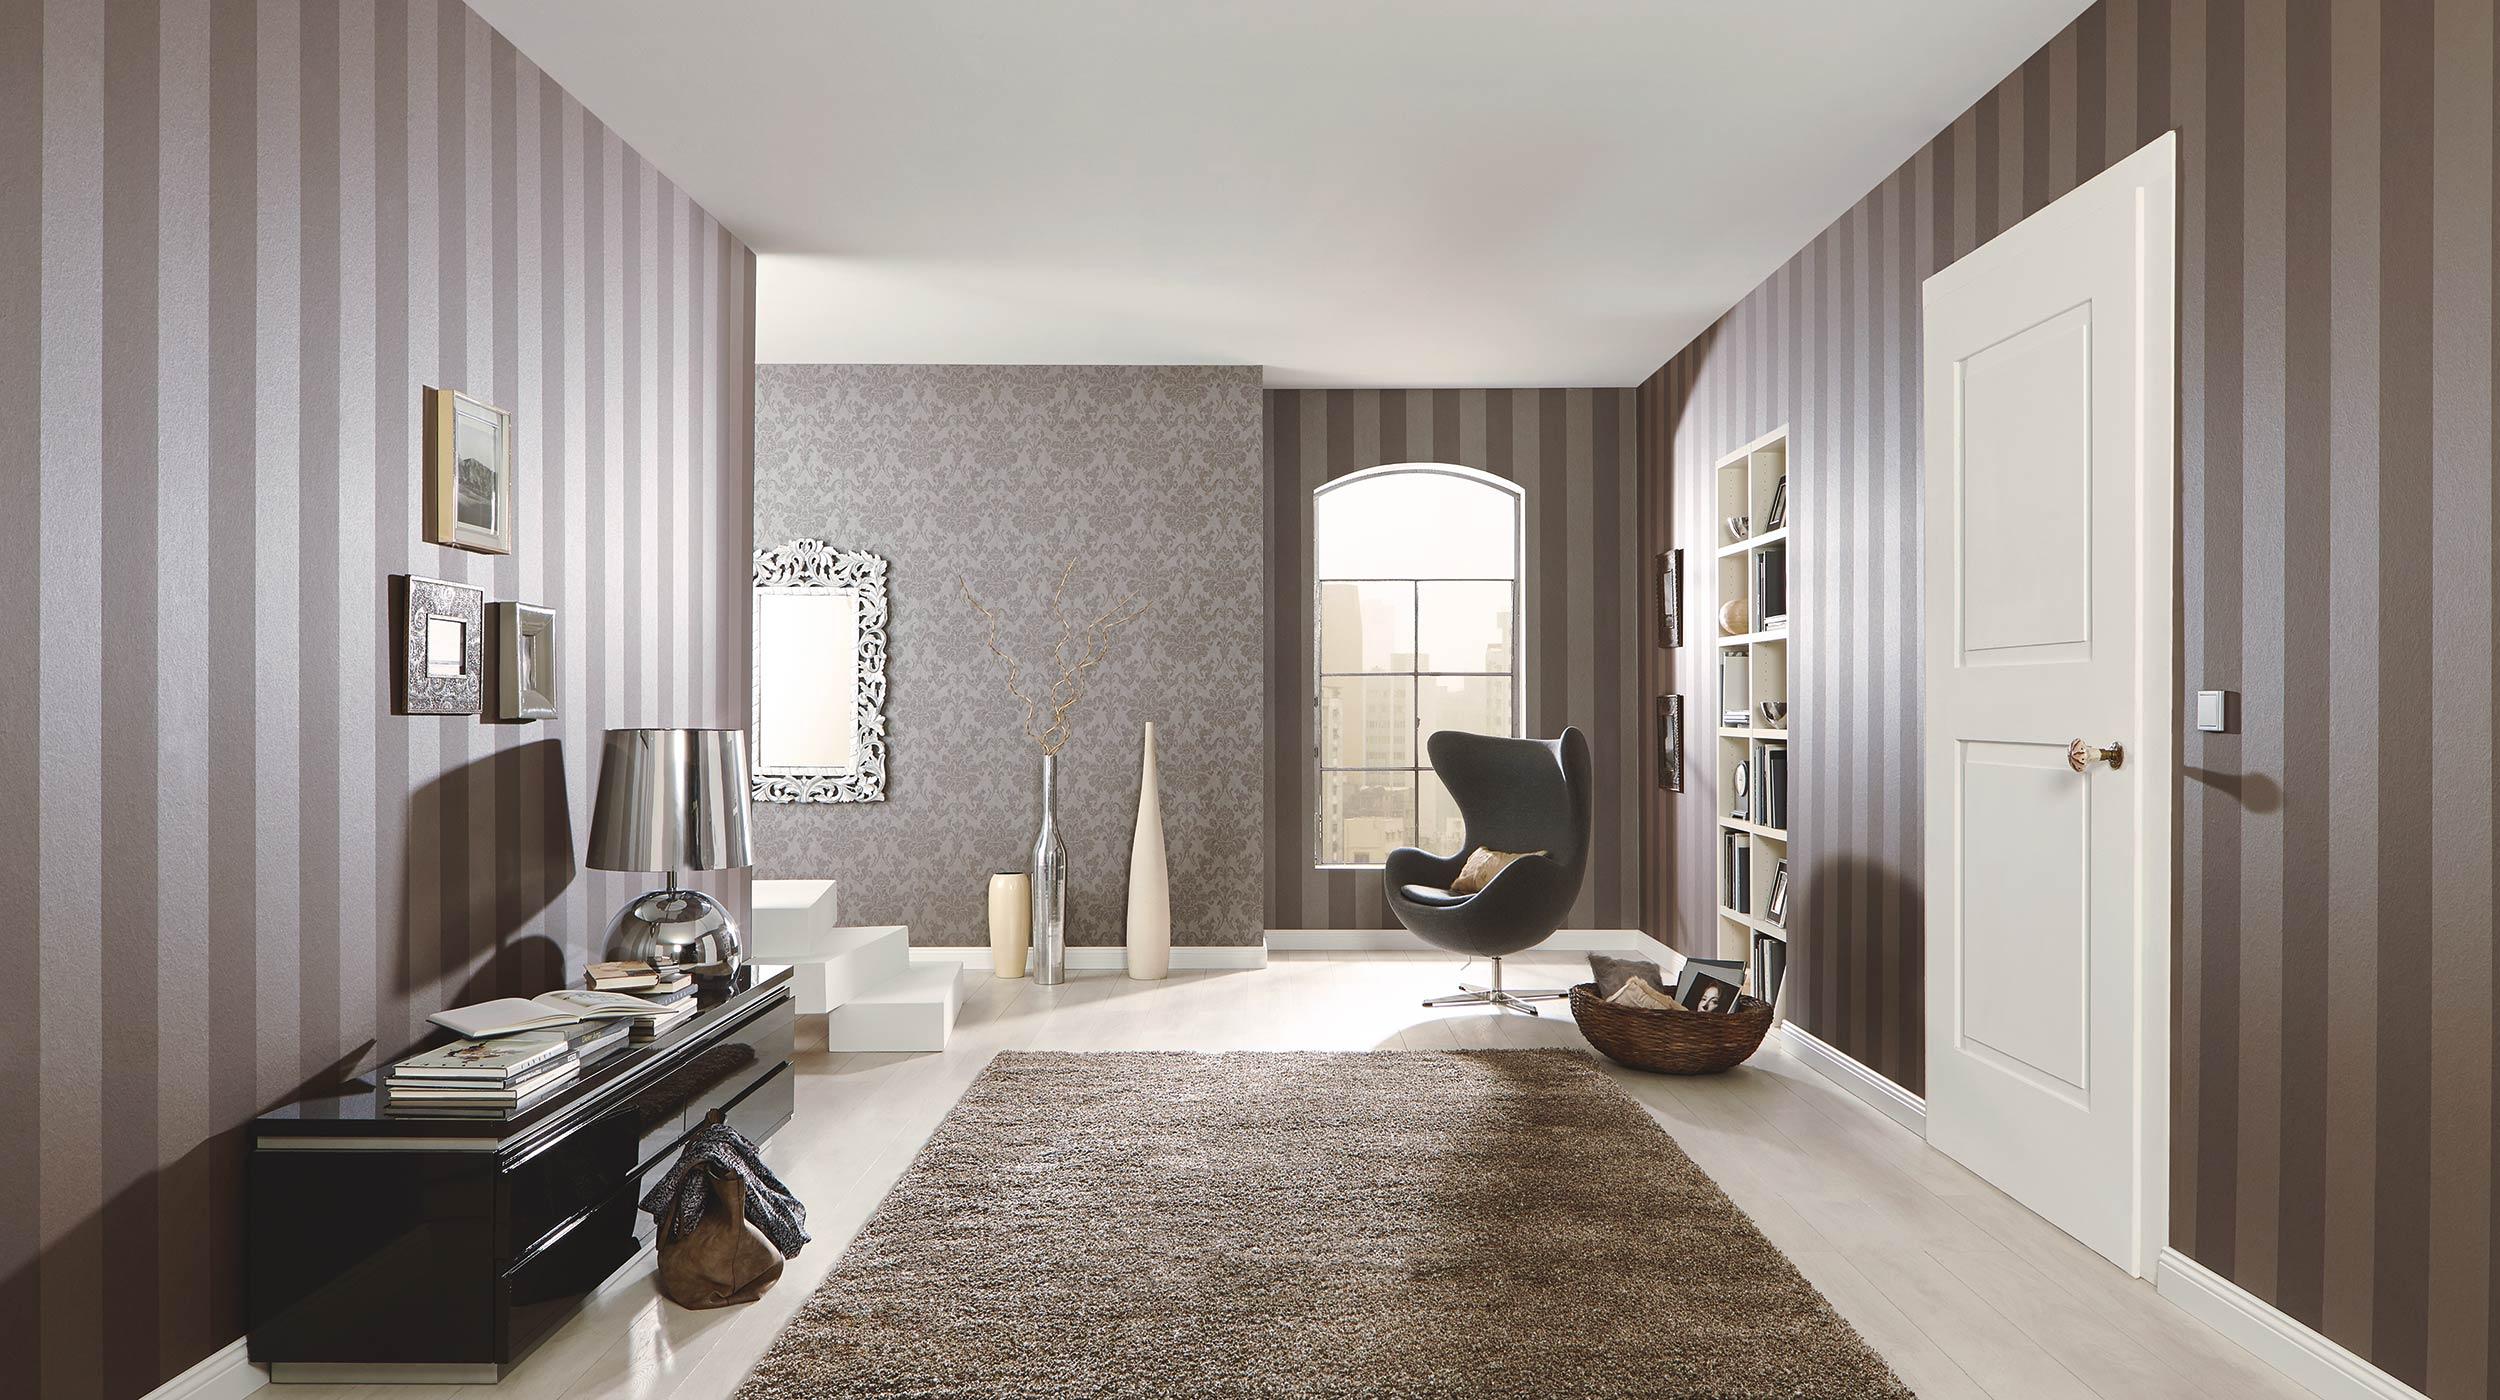 elysion erismann cie gmbh. Black Bedroom Furniture Sets. Home Design Ideas